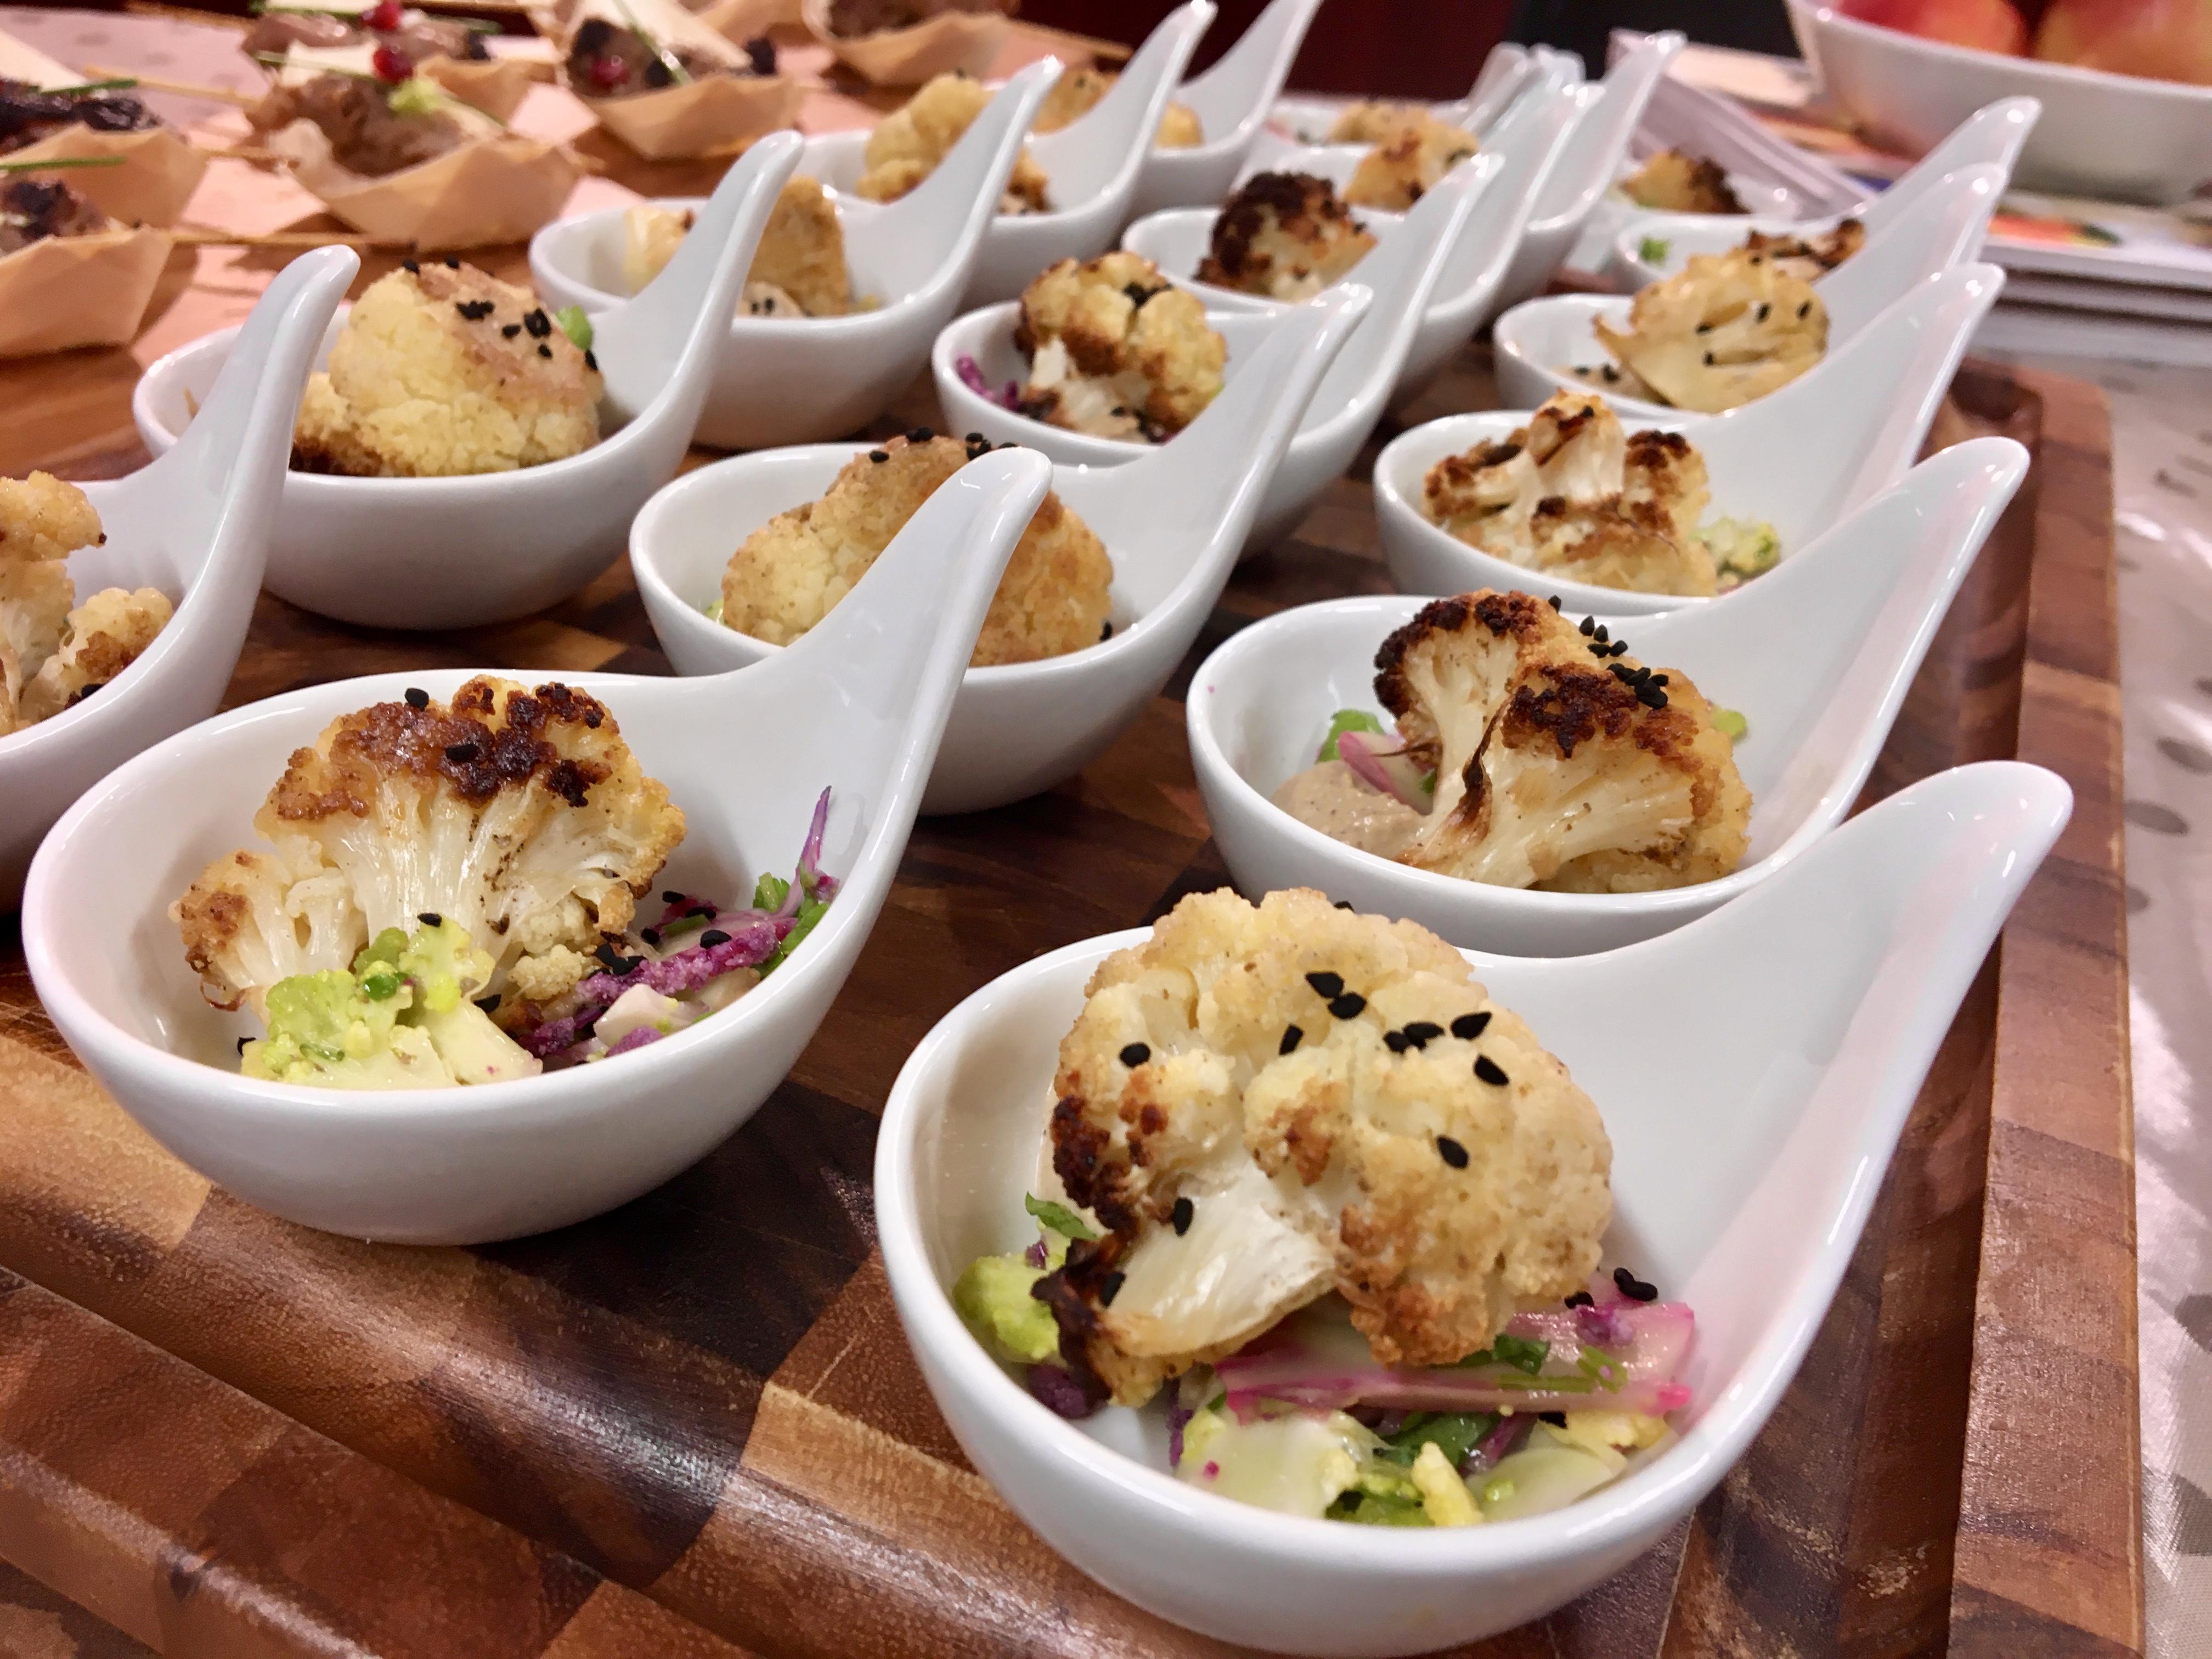 Finger Food With Jolanta – Roasted Cauliflower With Tahini Sauce